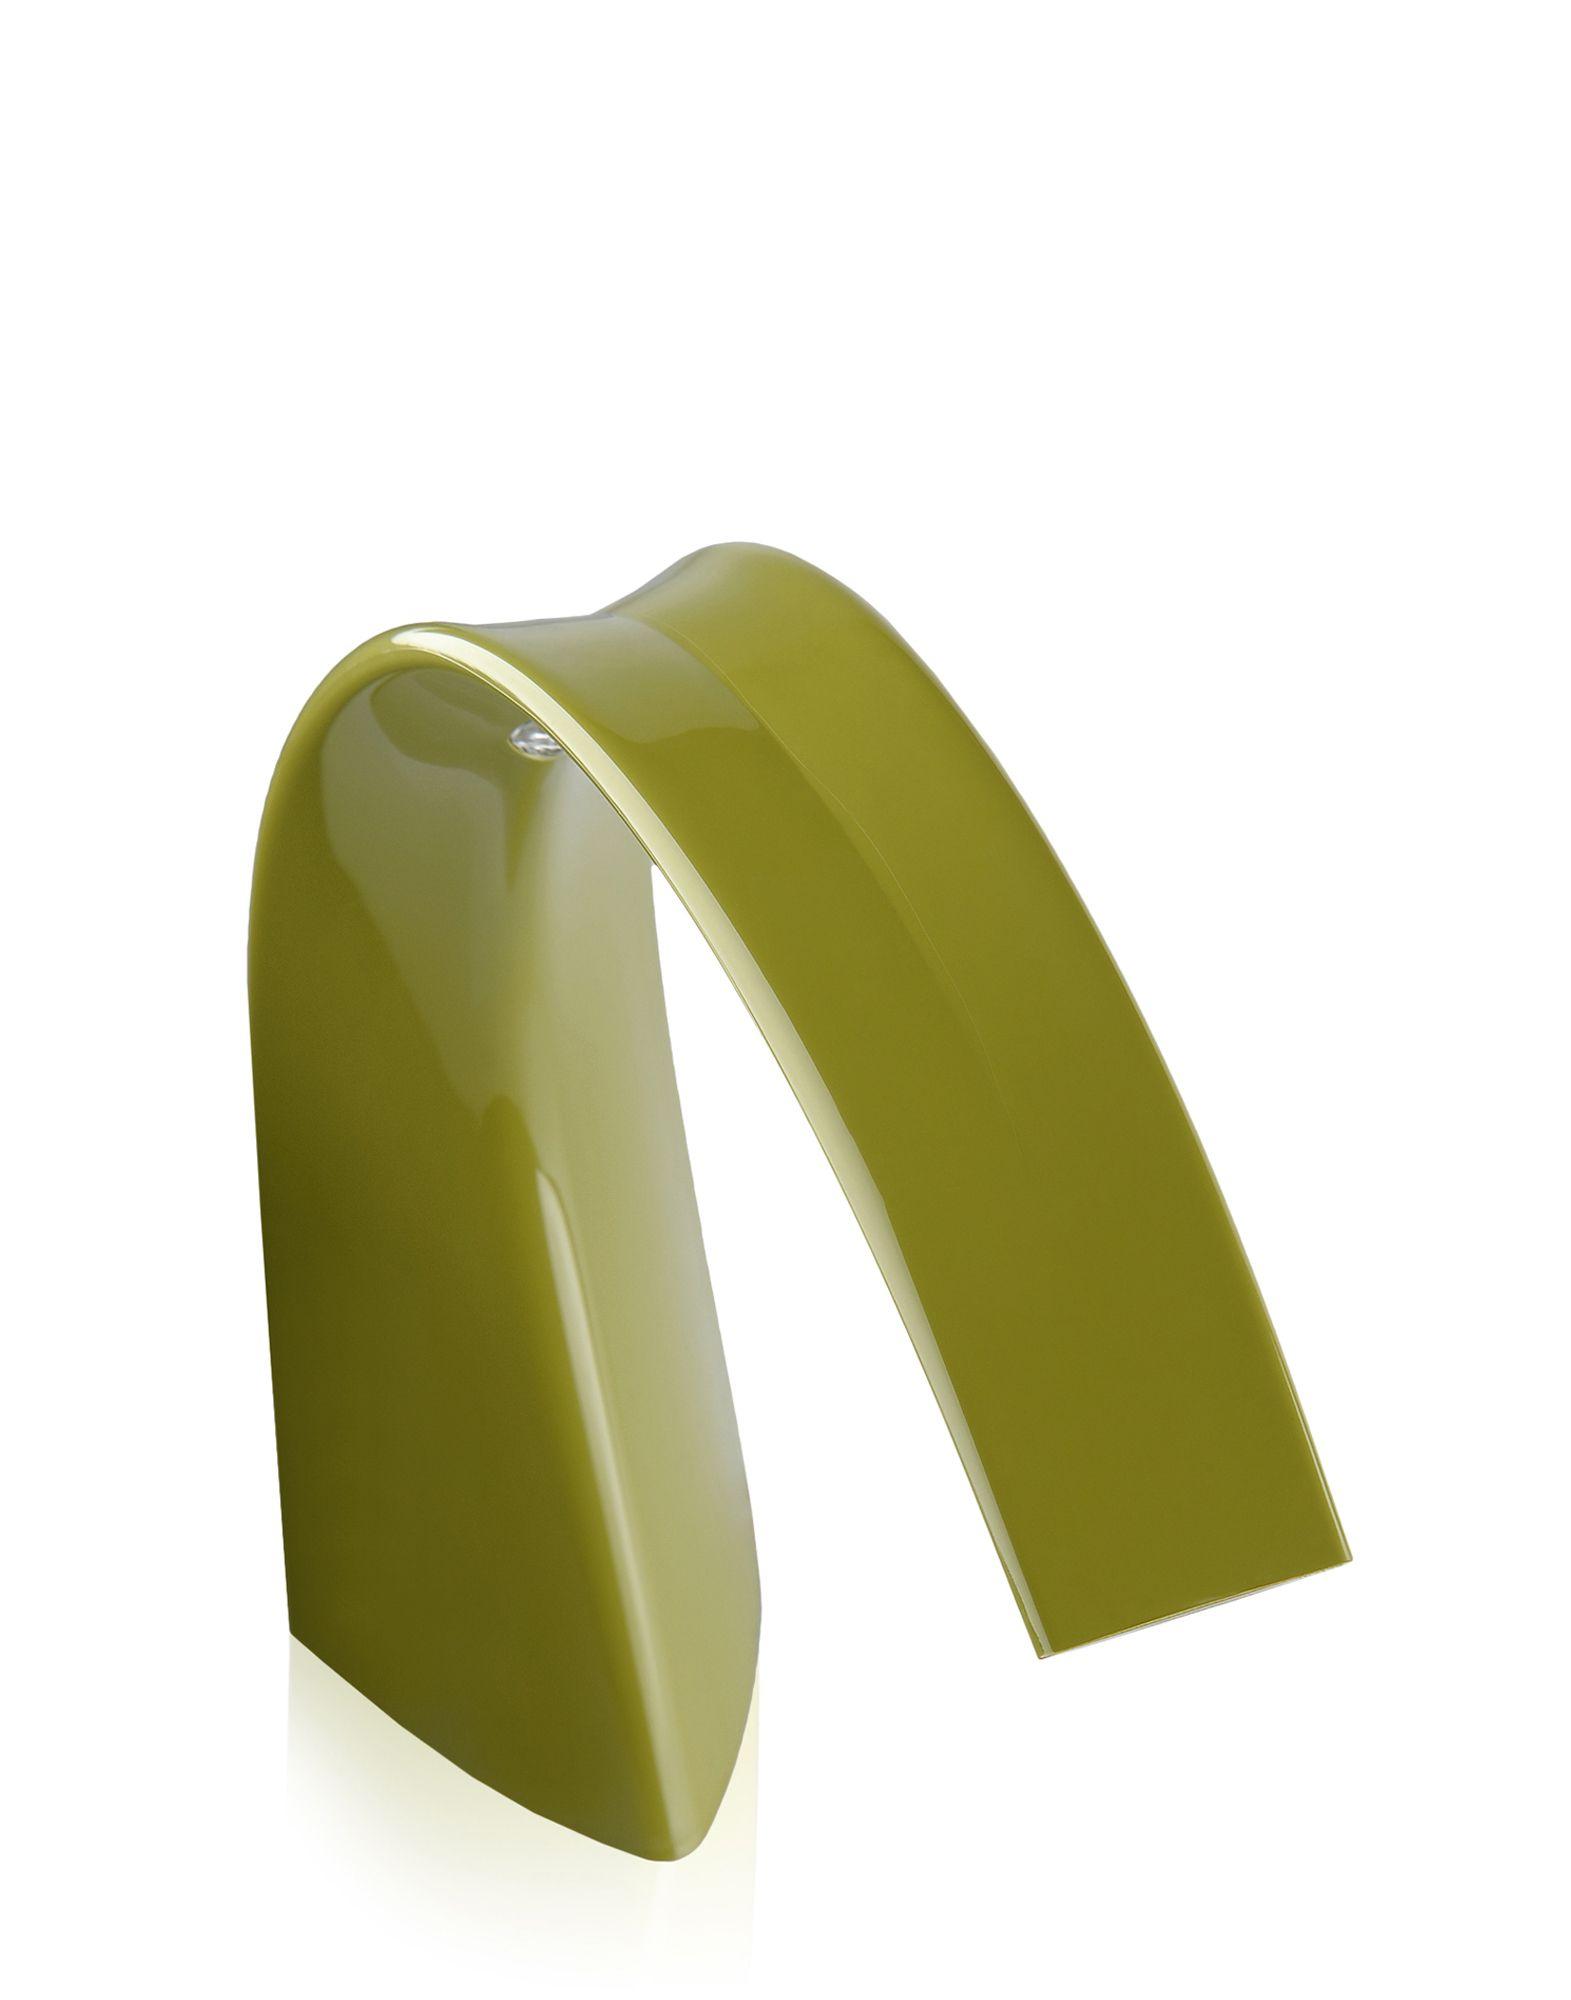 Lampada da tavolo kartell taj mini verde newformsdesign lampade da tavolo newformsdesign for Lampada da tavolo verde